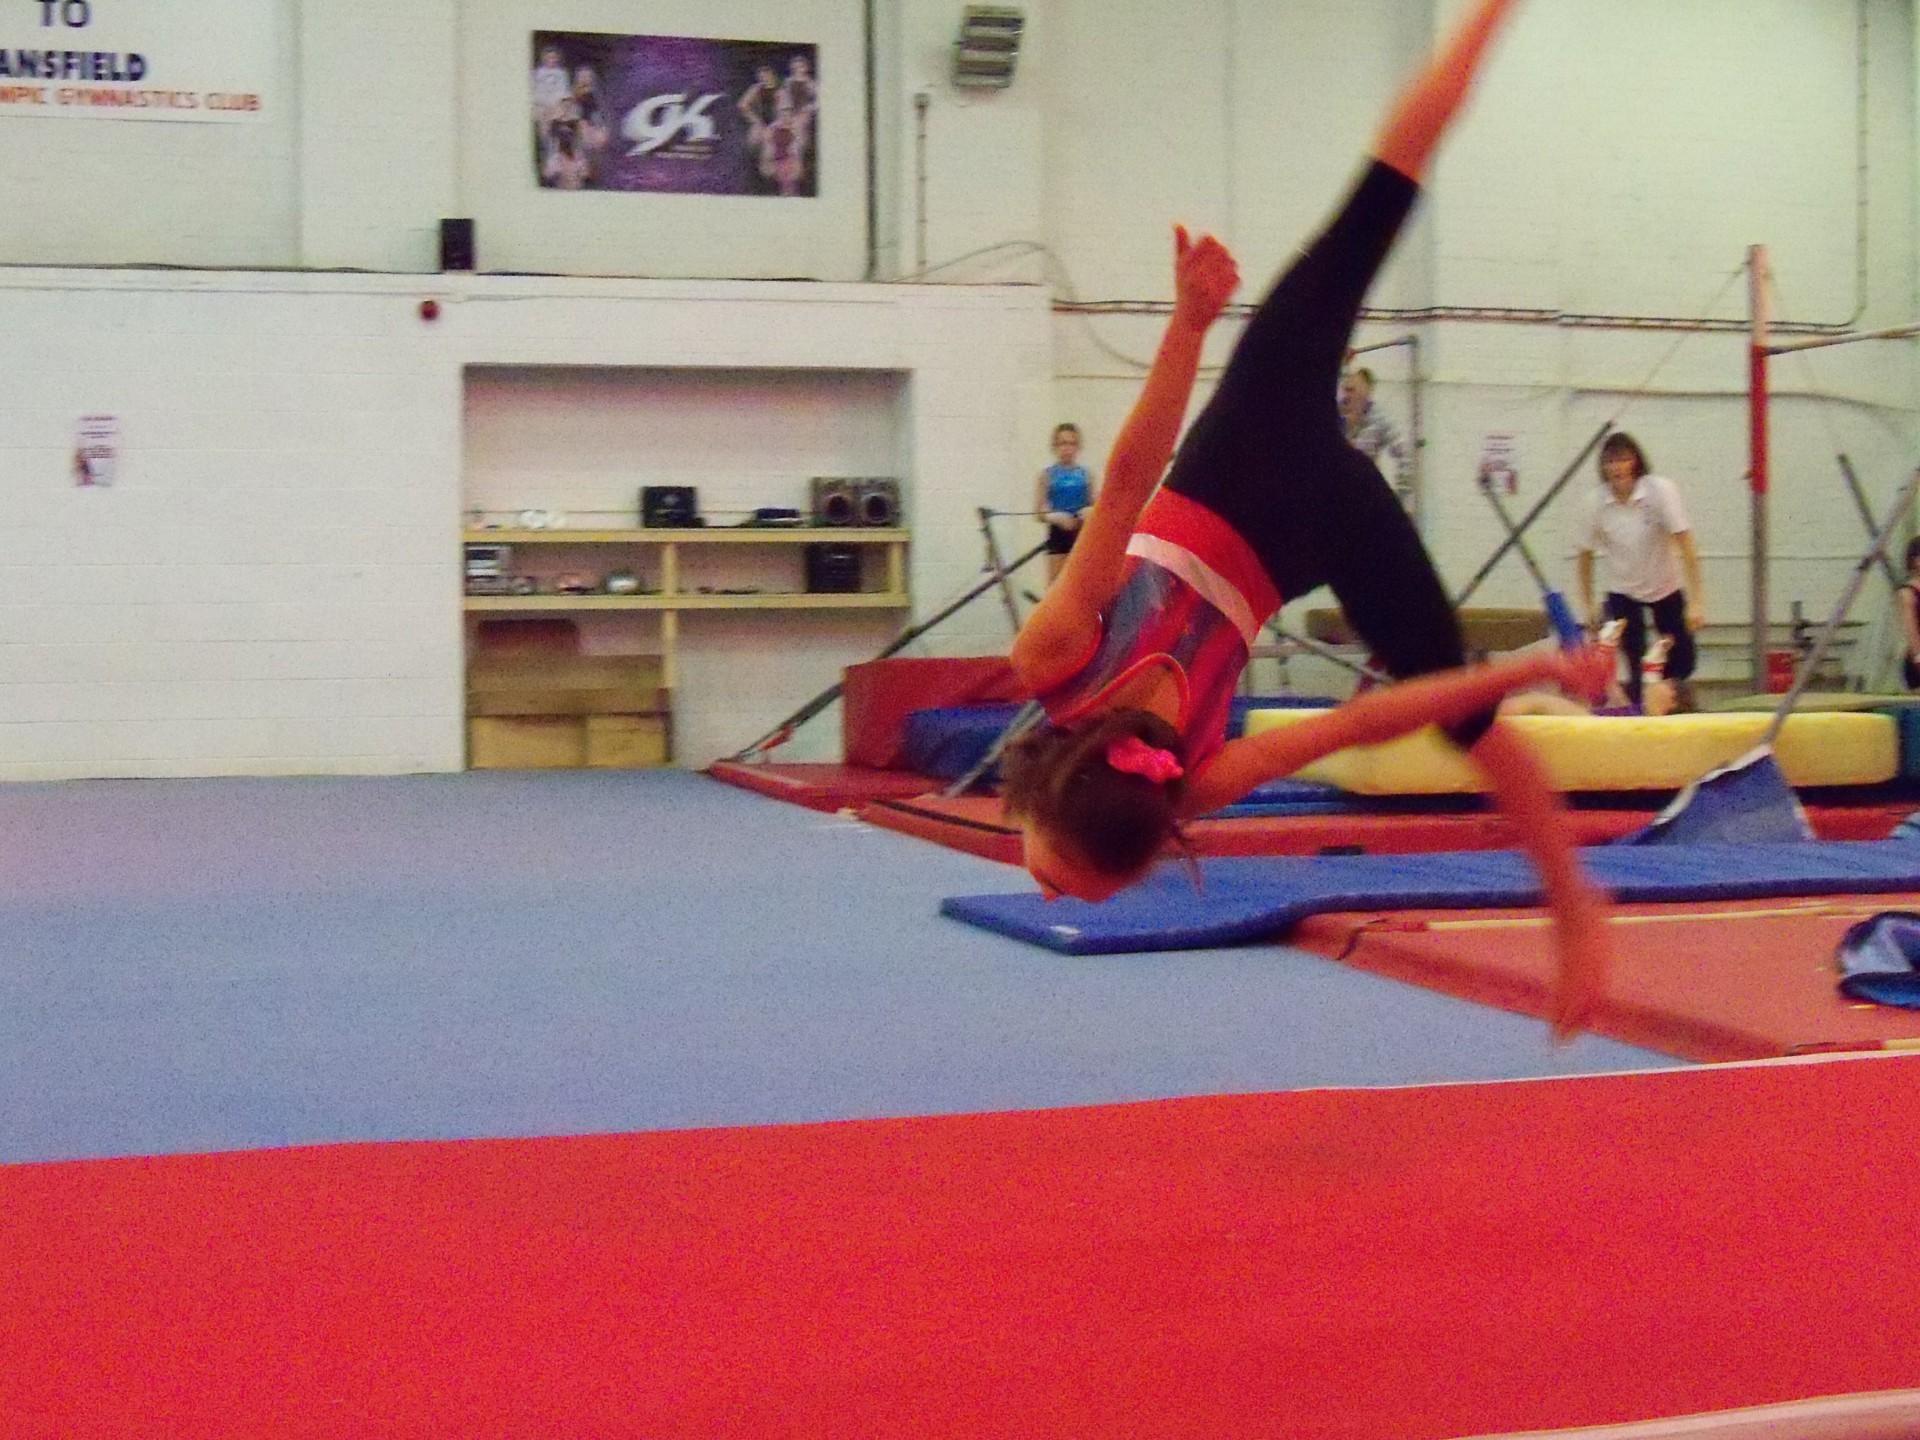 Mansfield Gymnastics